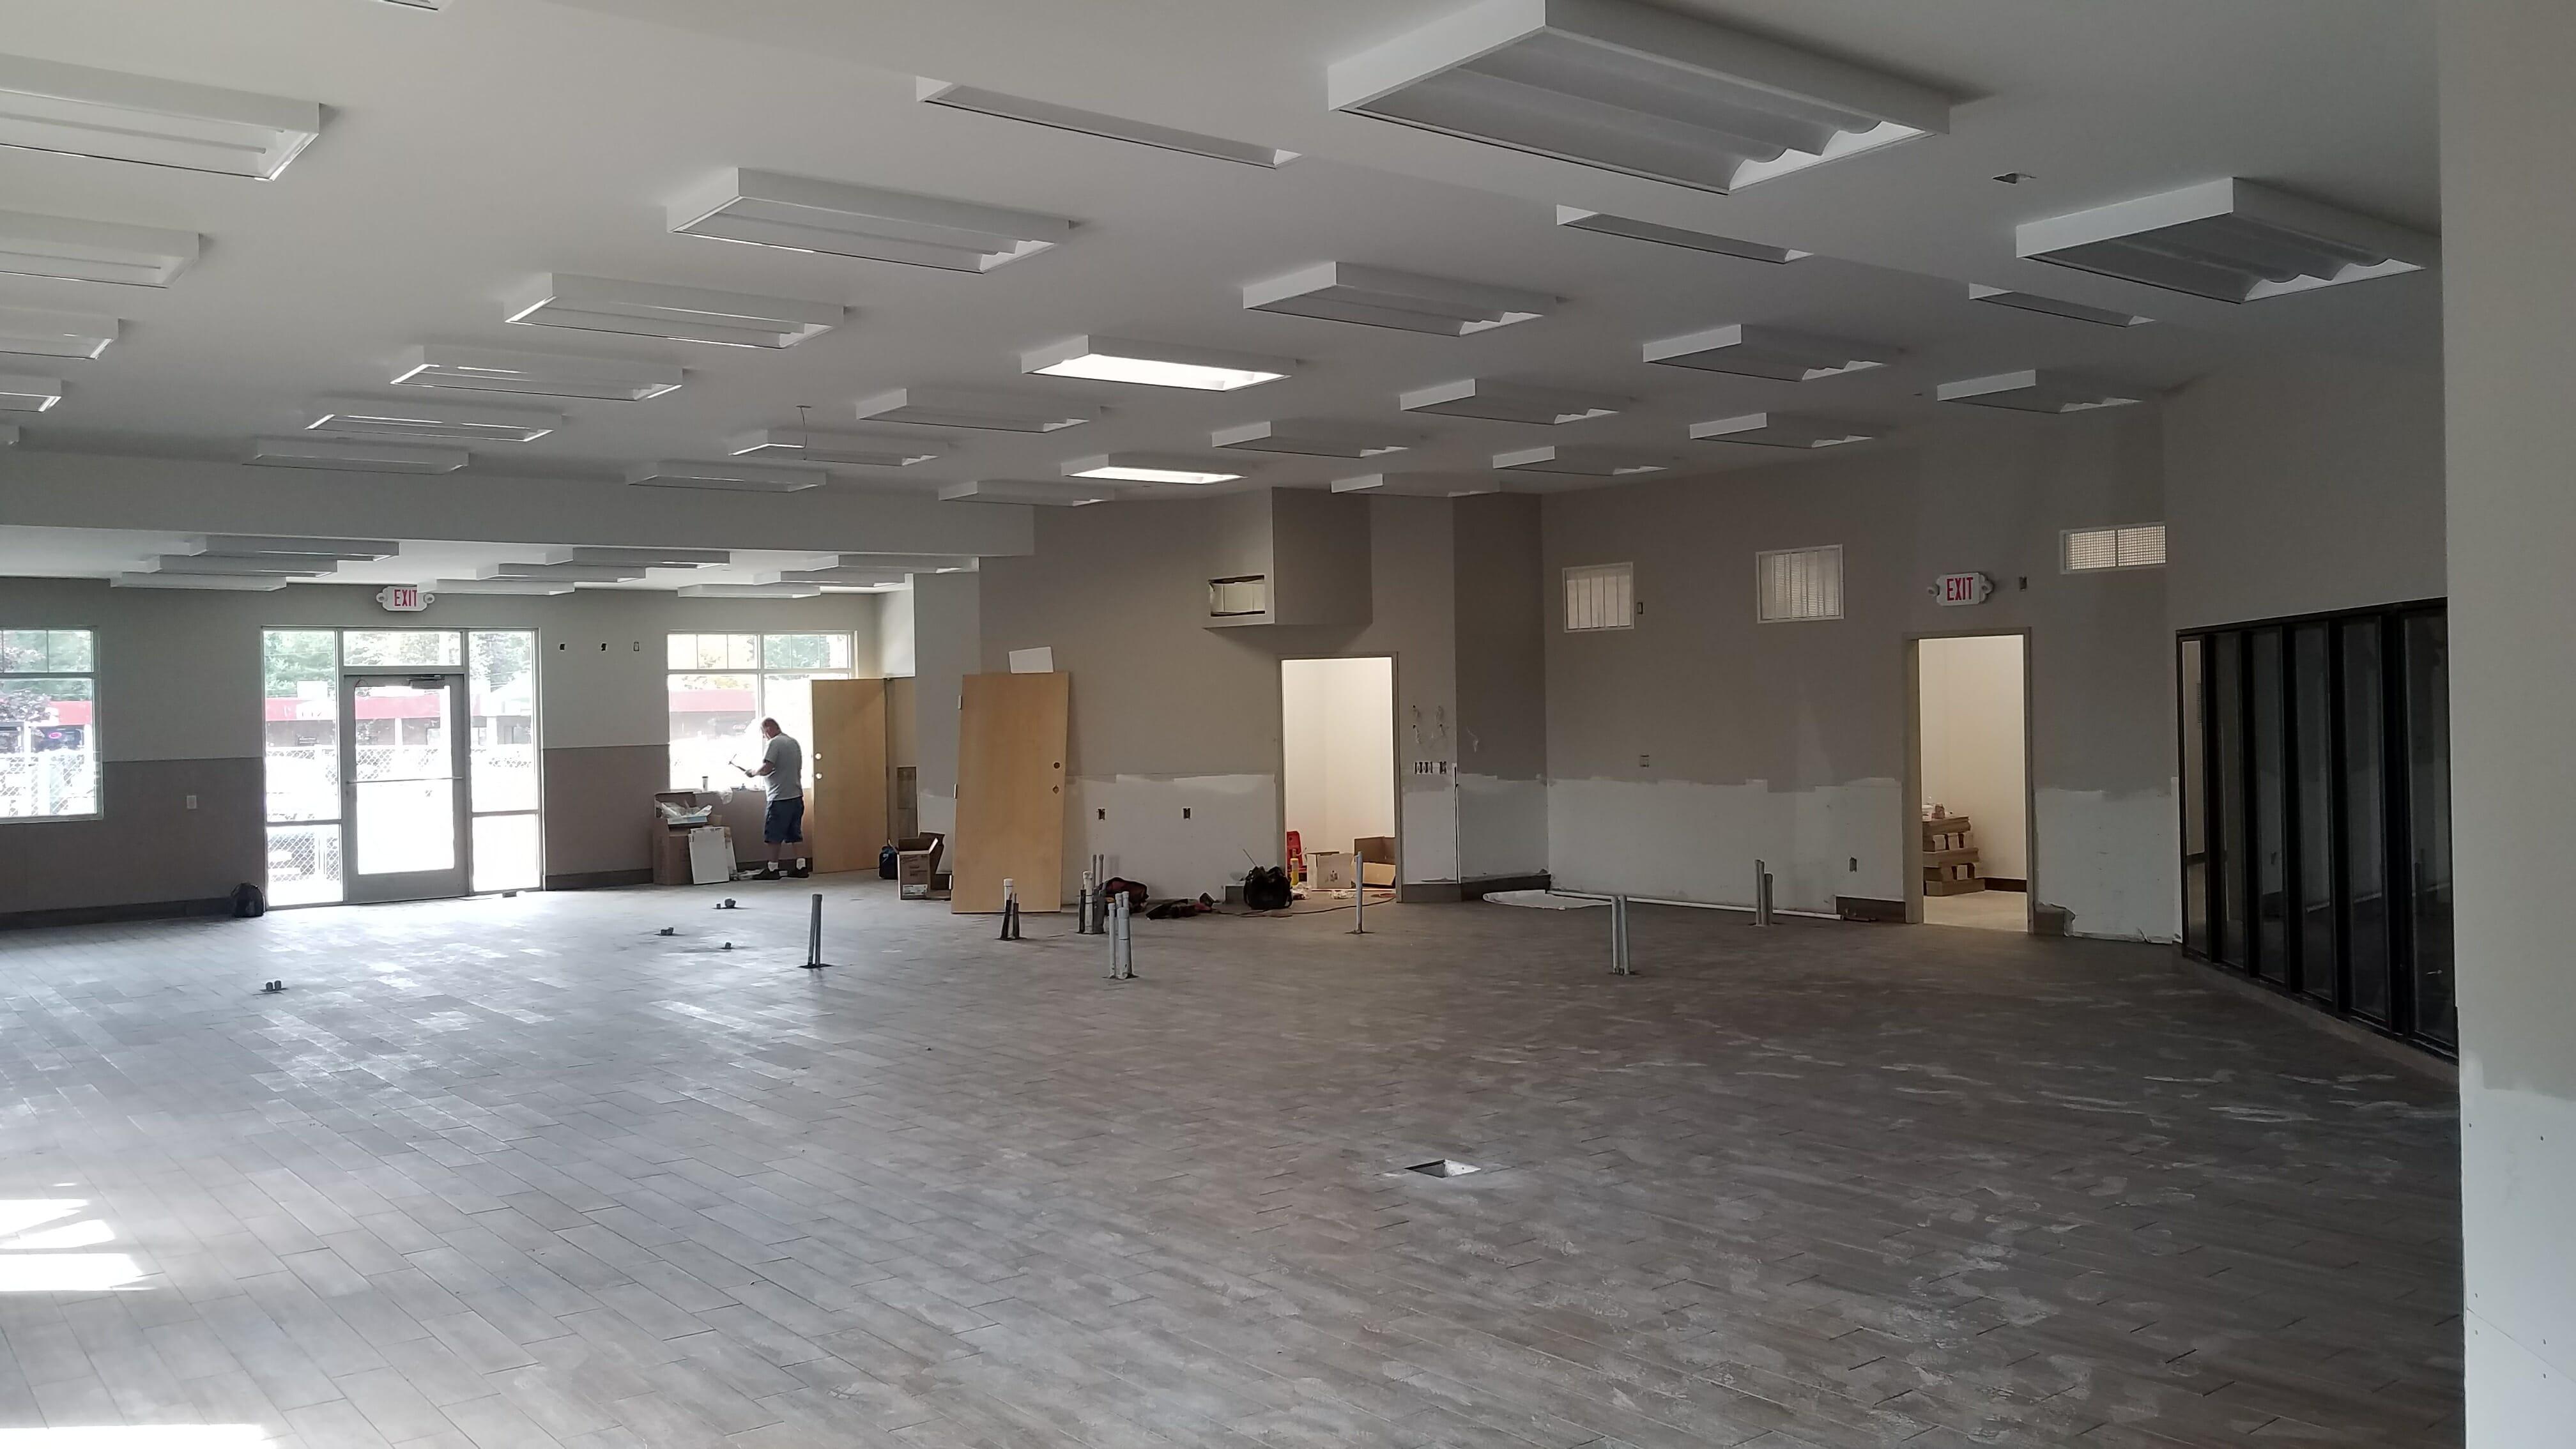 Interior of shop walls being built, Aviation Rd Stewart's Shop